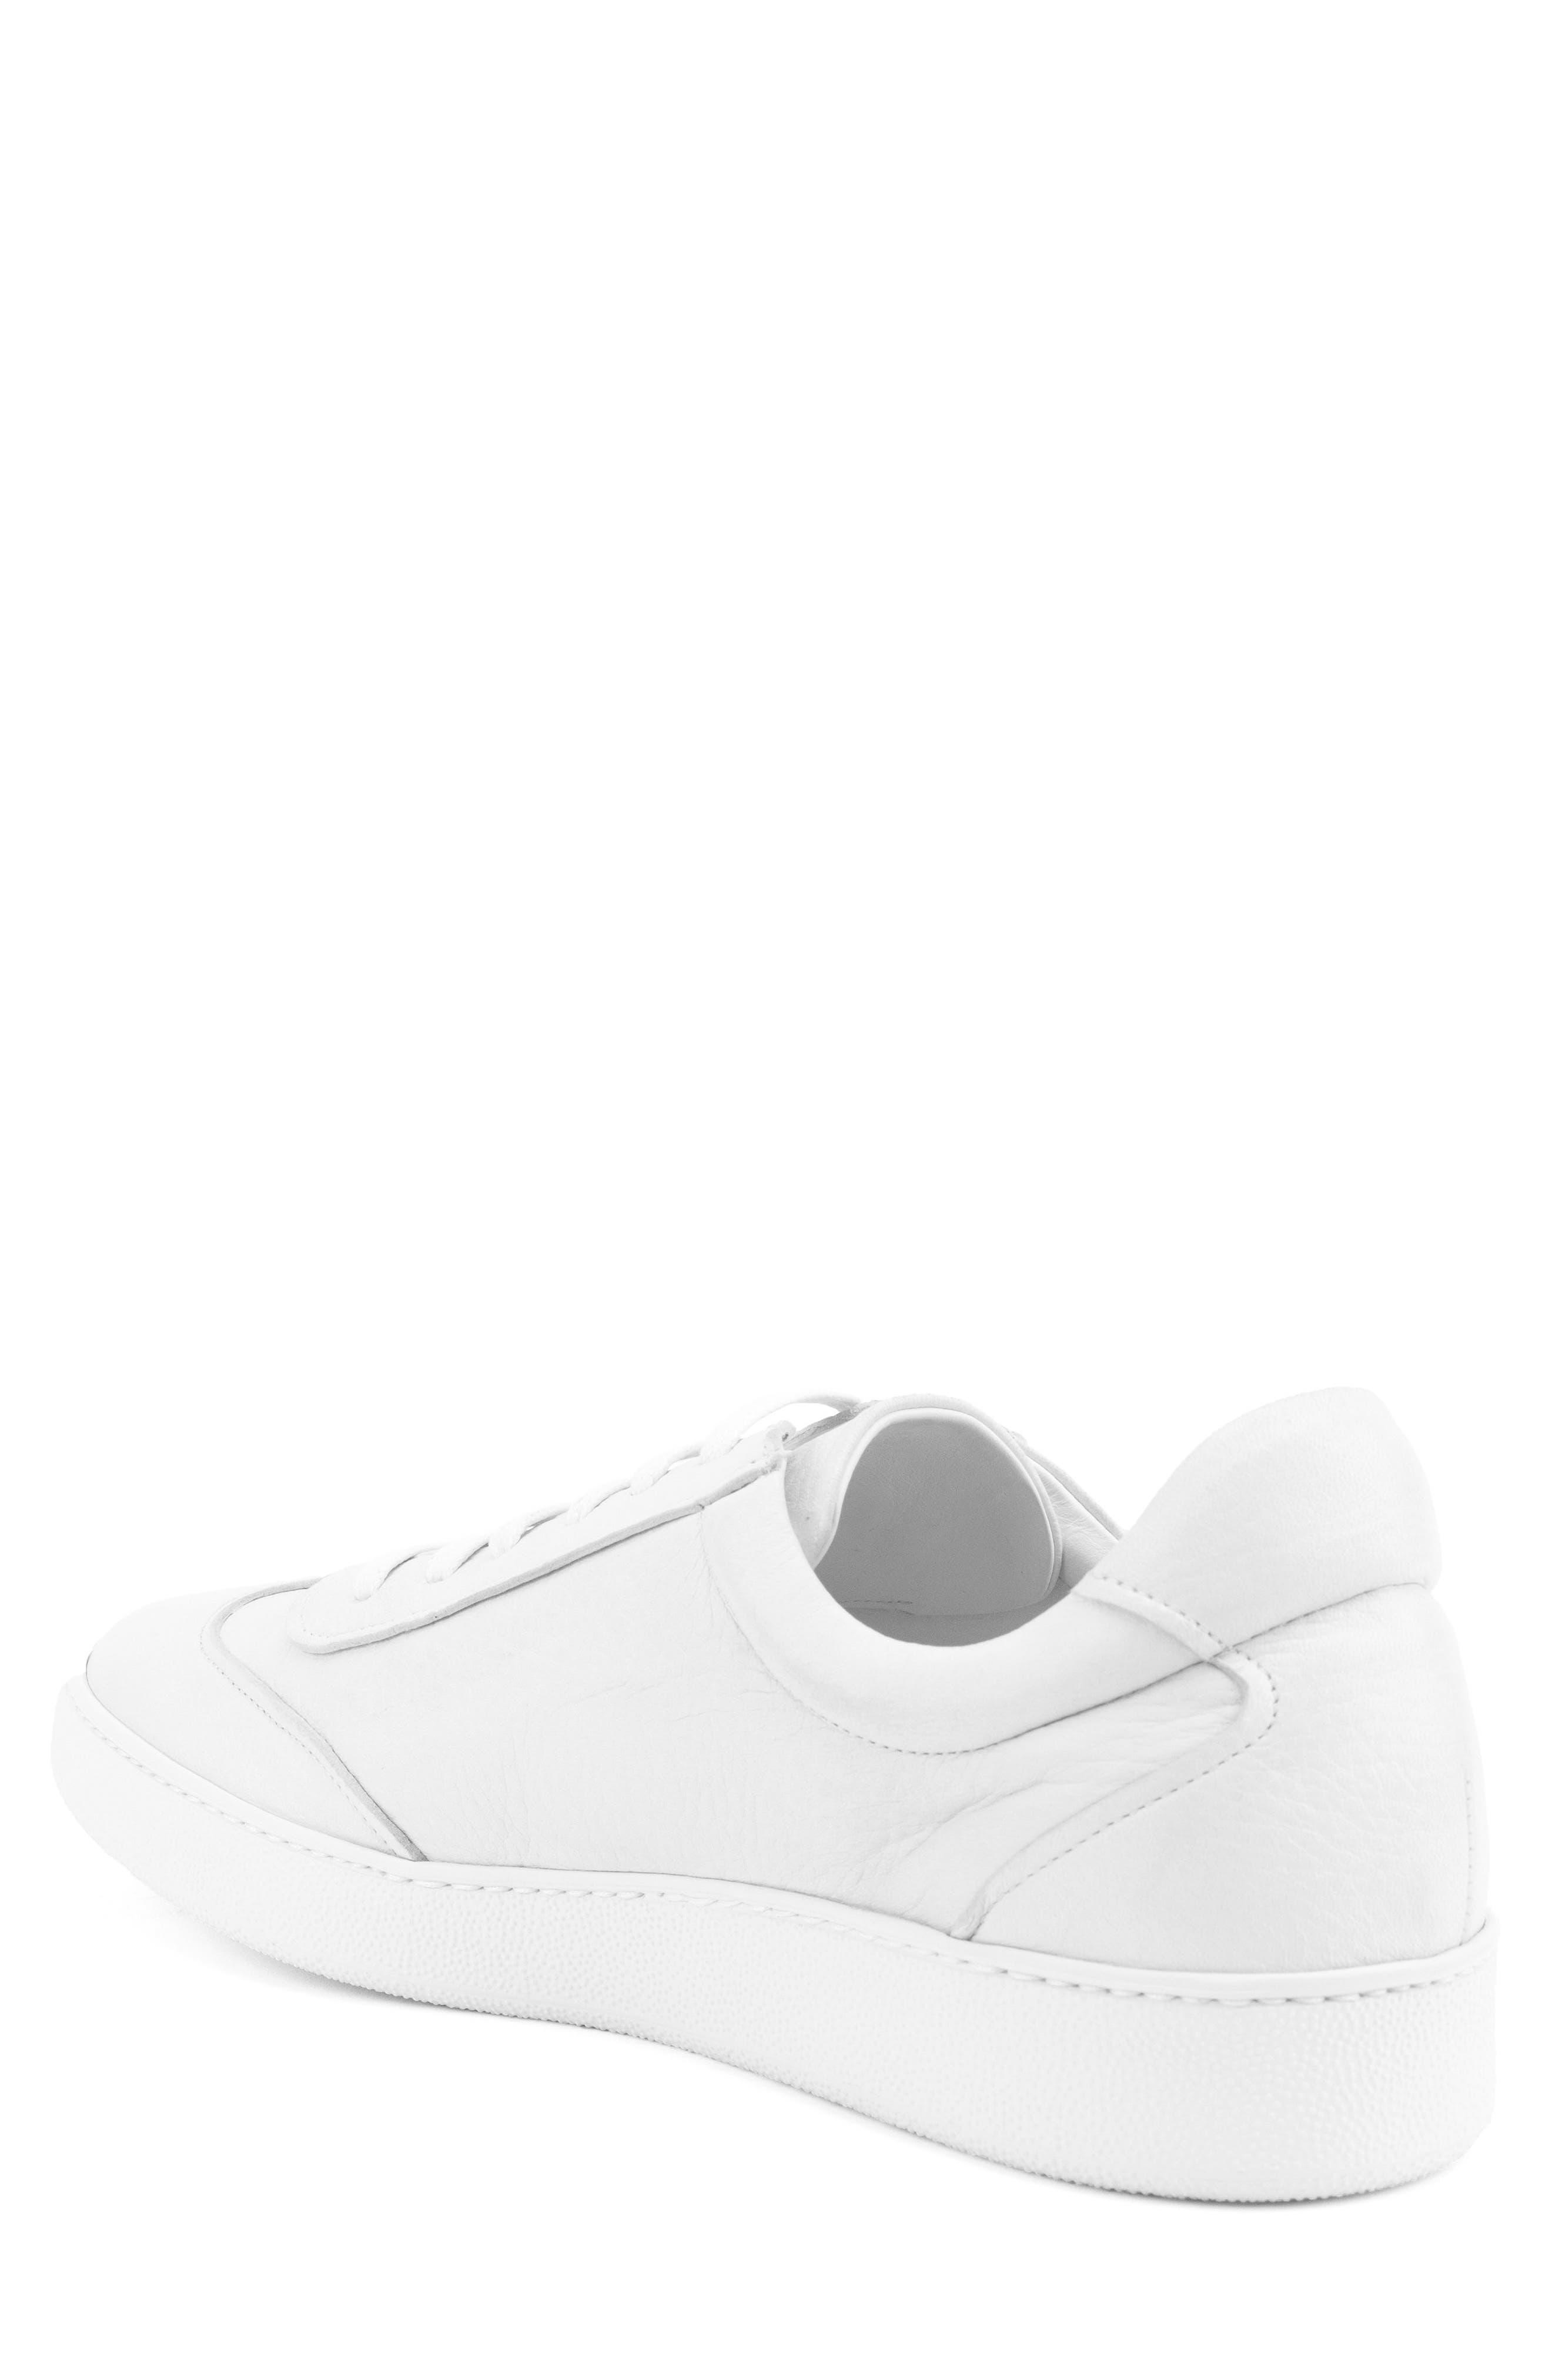 Tristan Sneaker,                             Alternate thumbnail 2, color,                             WHITE LEATHER